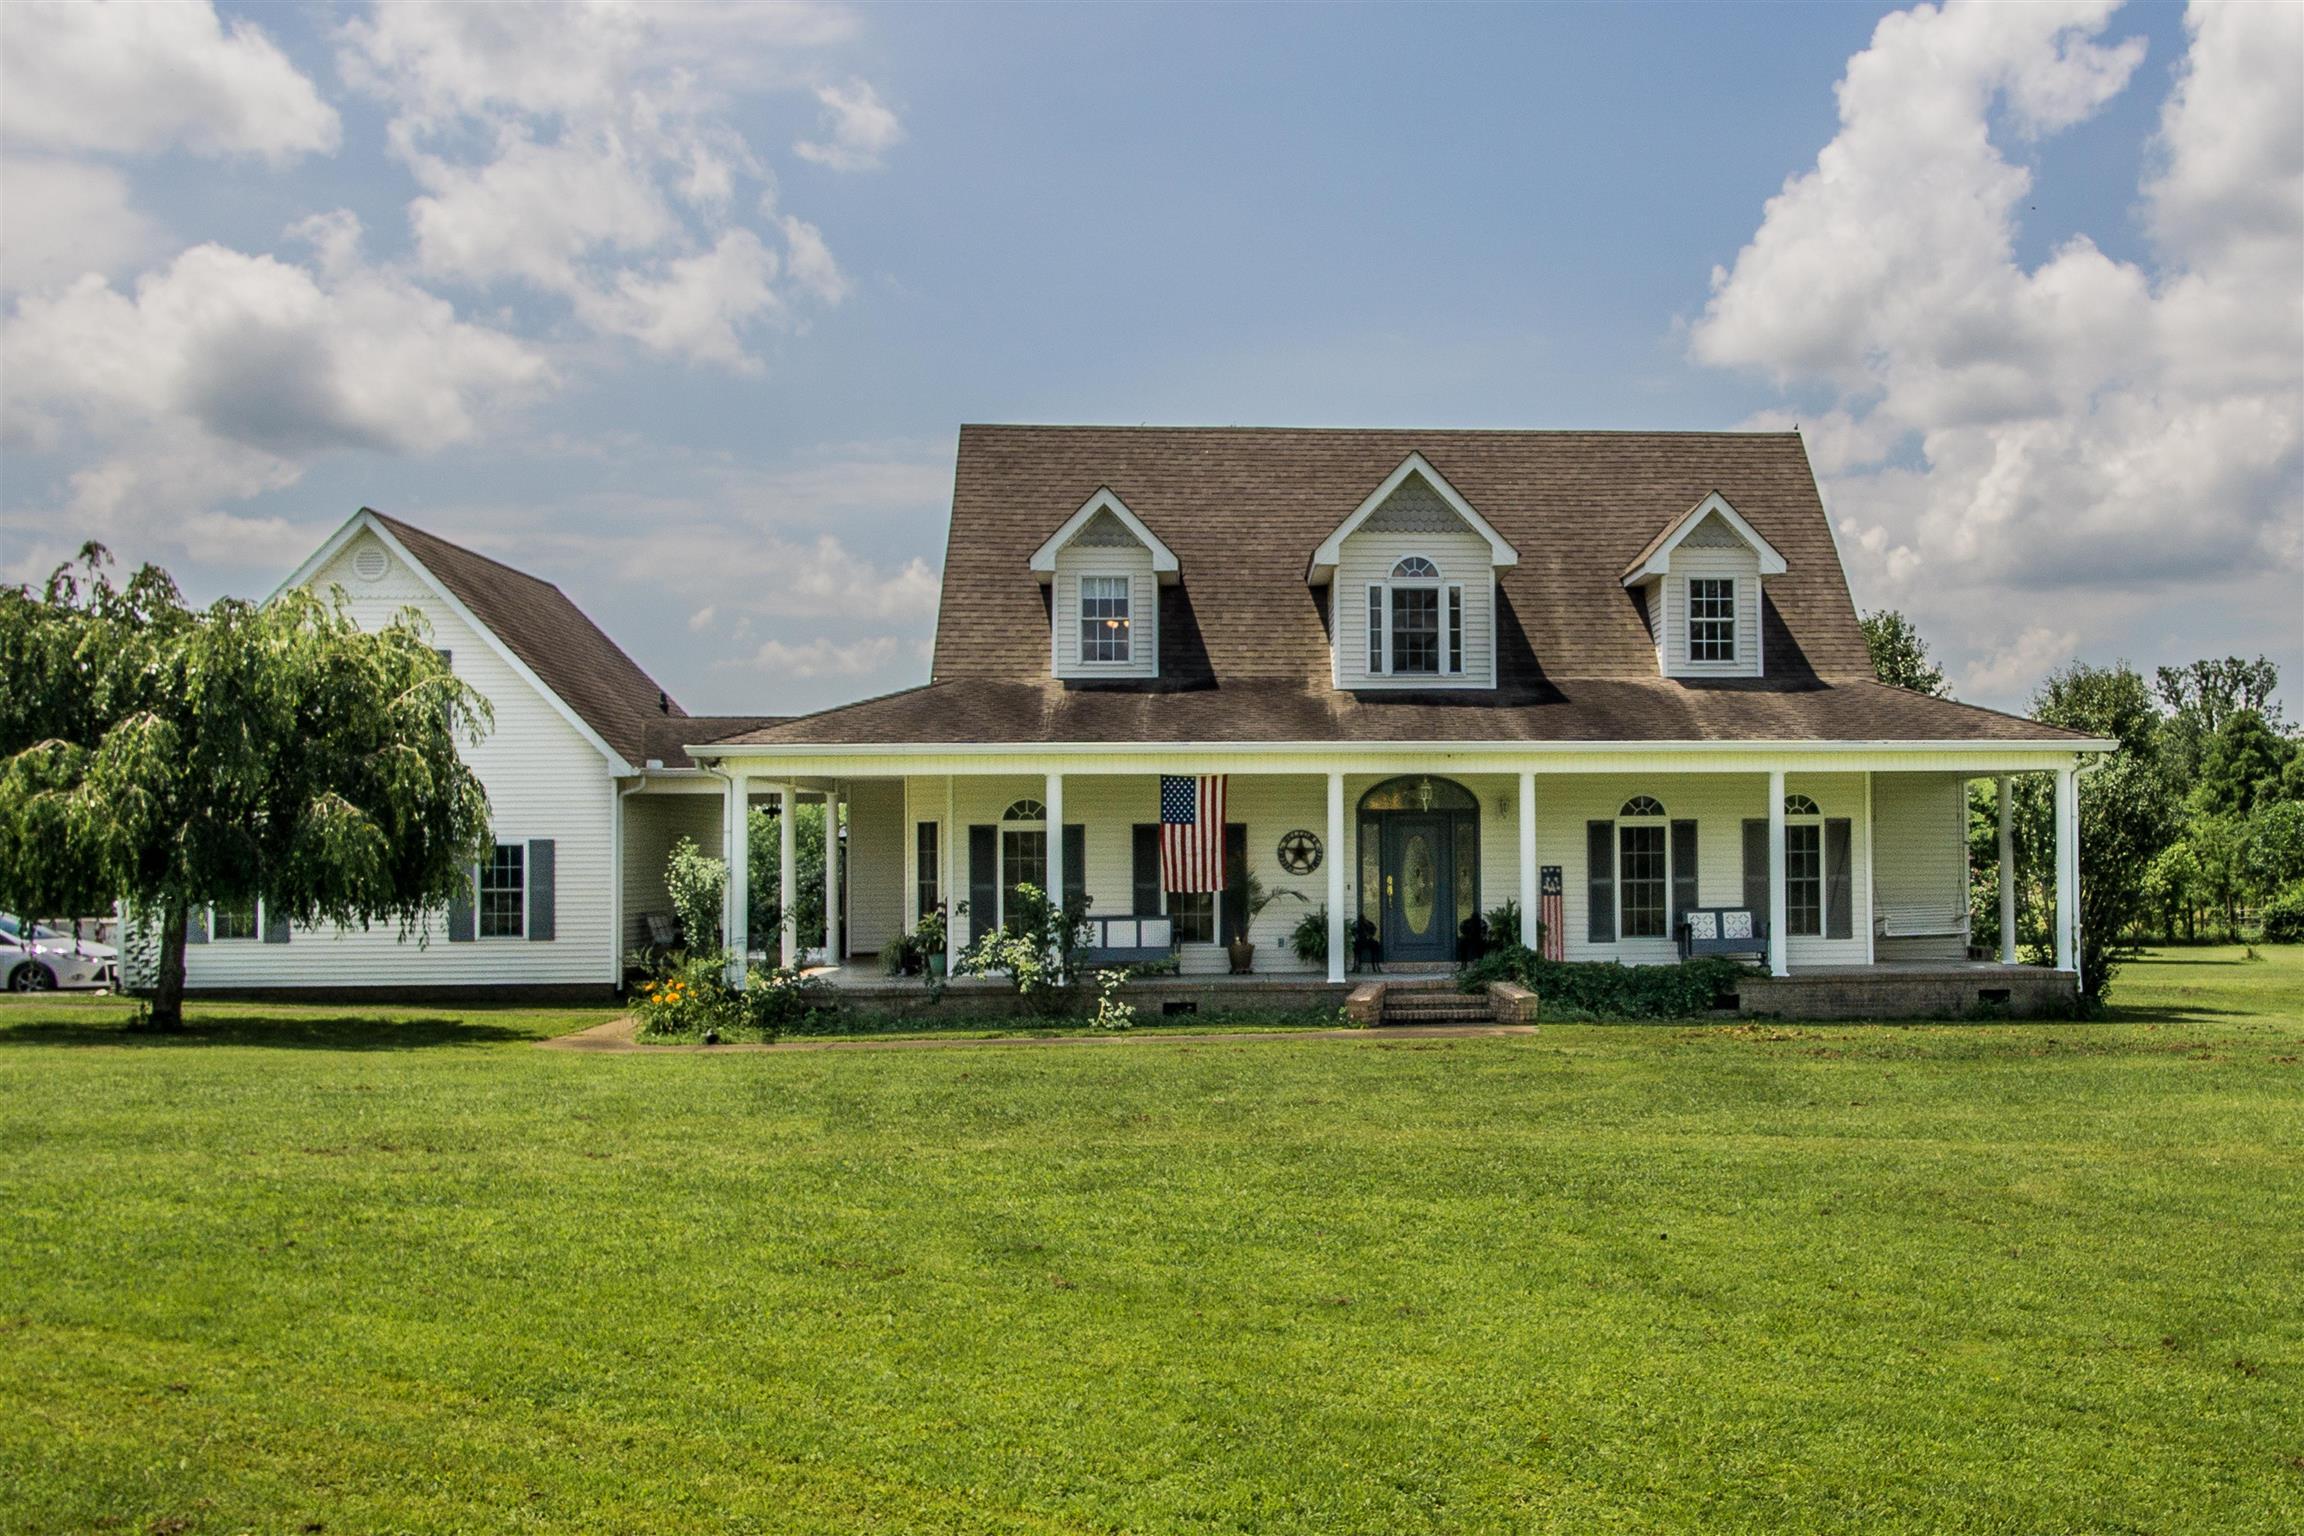 8807 OC Floyd Rd, College Grove, TN 37046 - College Grove, TN real estate listing